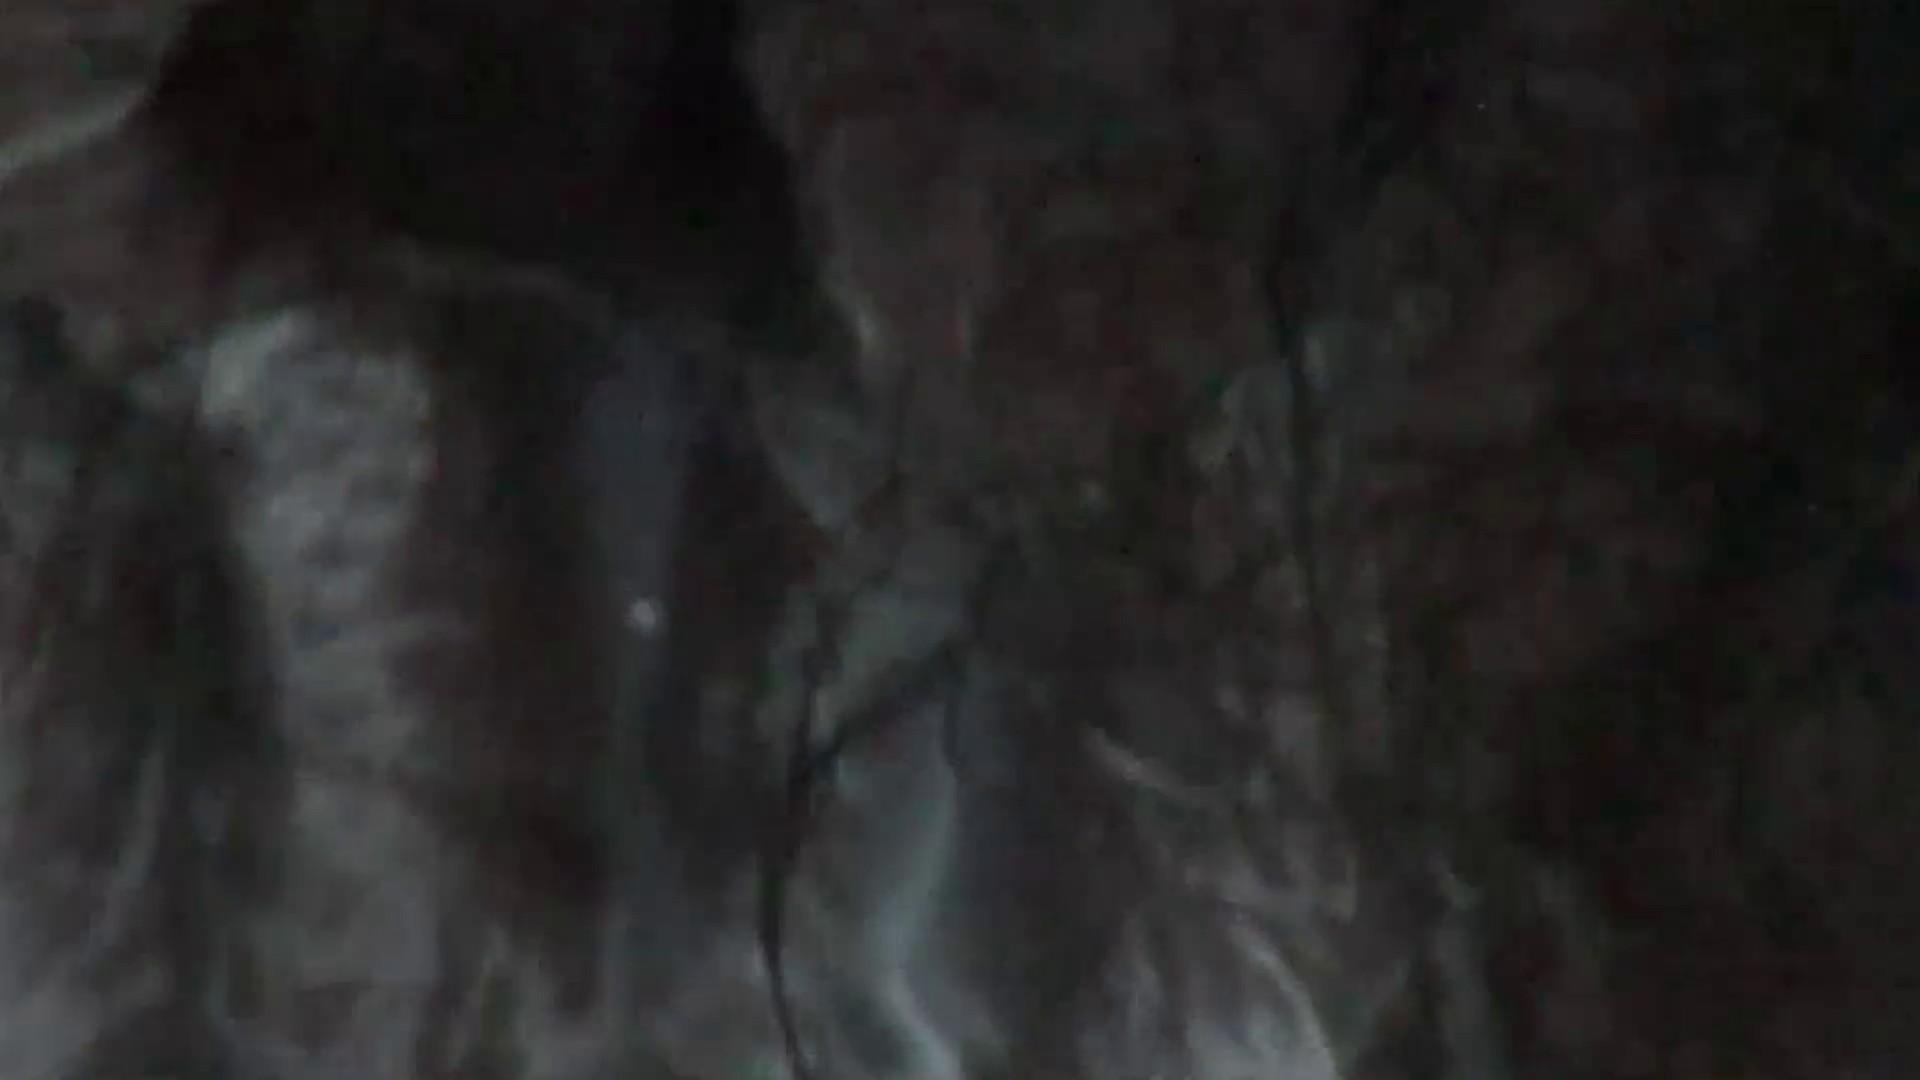 JD盗撮 美女の洗面所の秘密 Vol.40 美肌 オマンコ動画キャプチャ 107枚 106